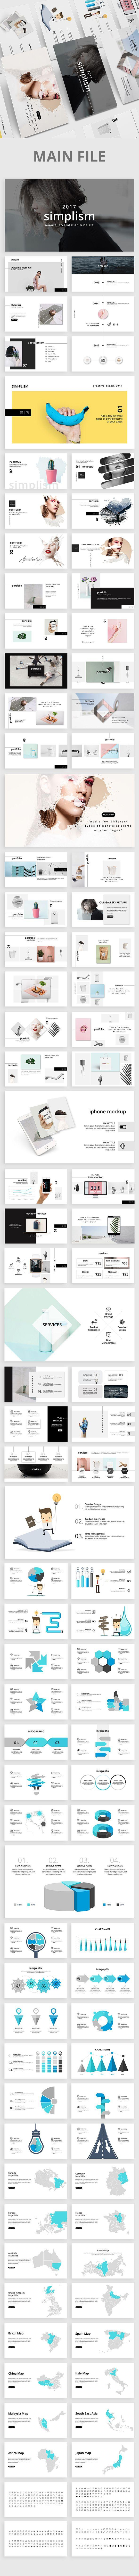 Simplism minimal keynote template pagina web diseo editorial y simplism minimal keynote template pagina web diseo editorial y editorial ccuart Image collections